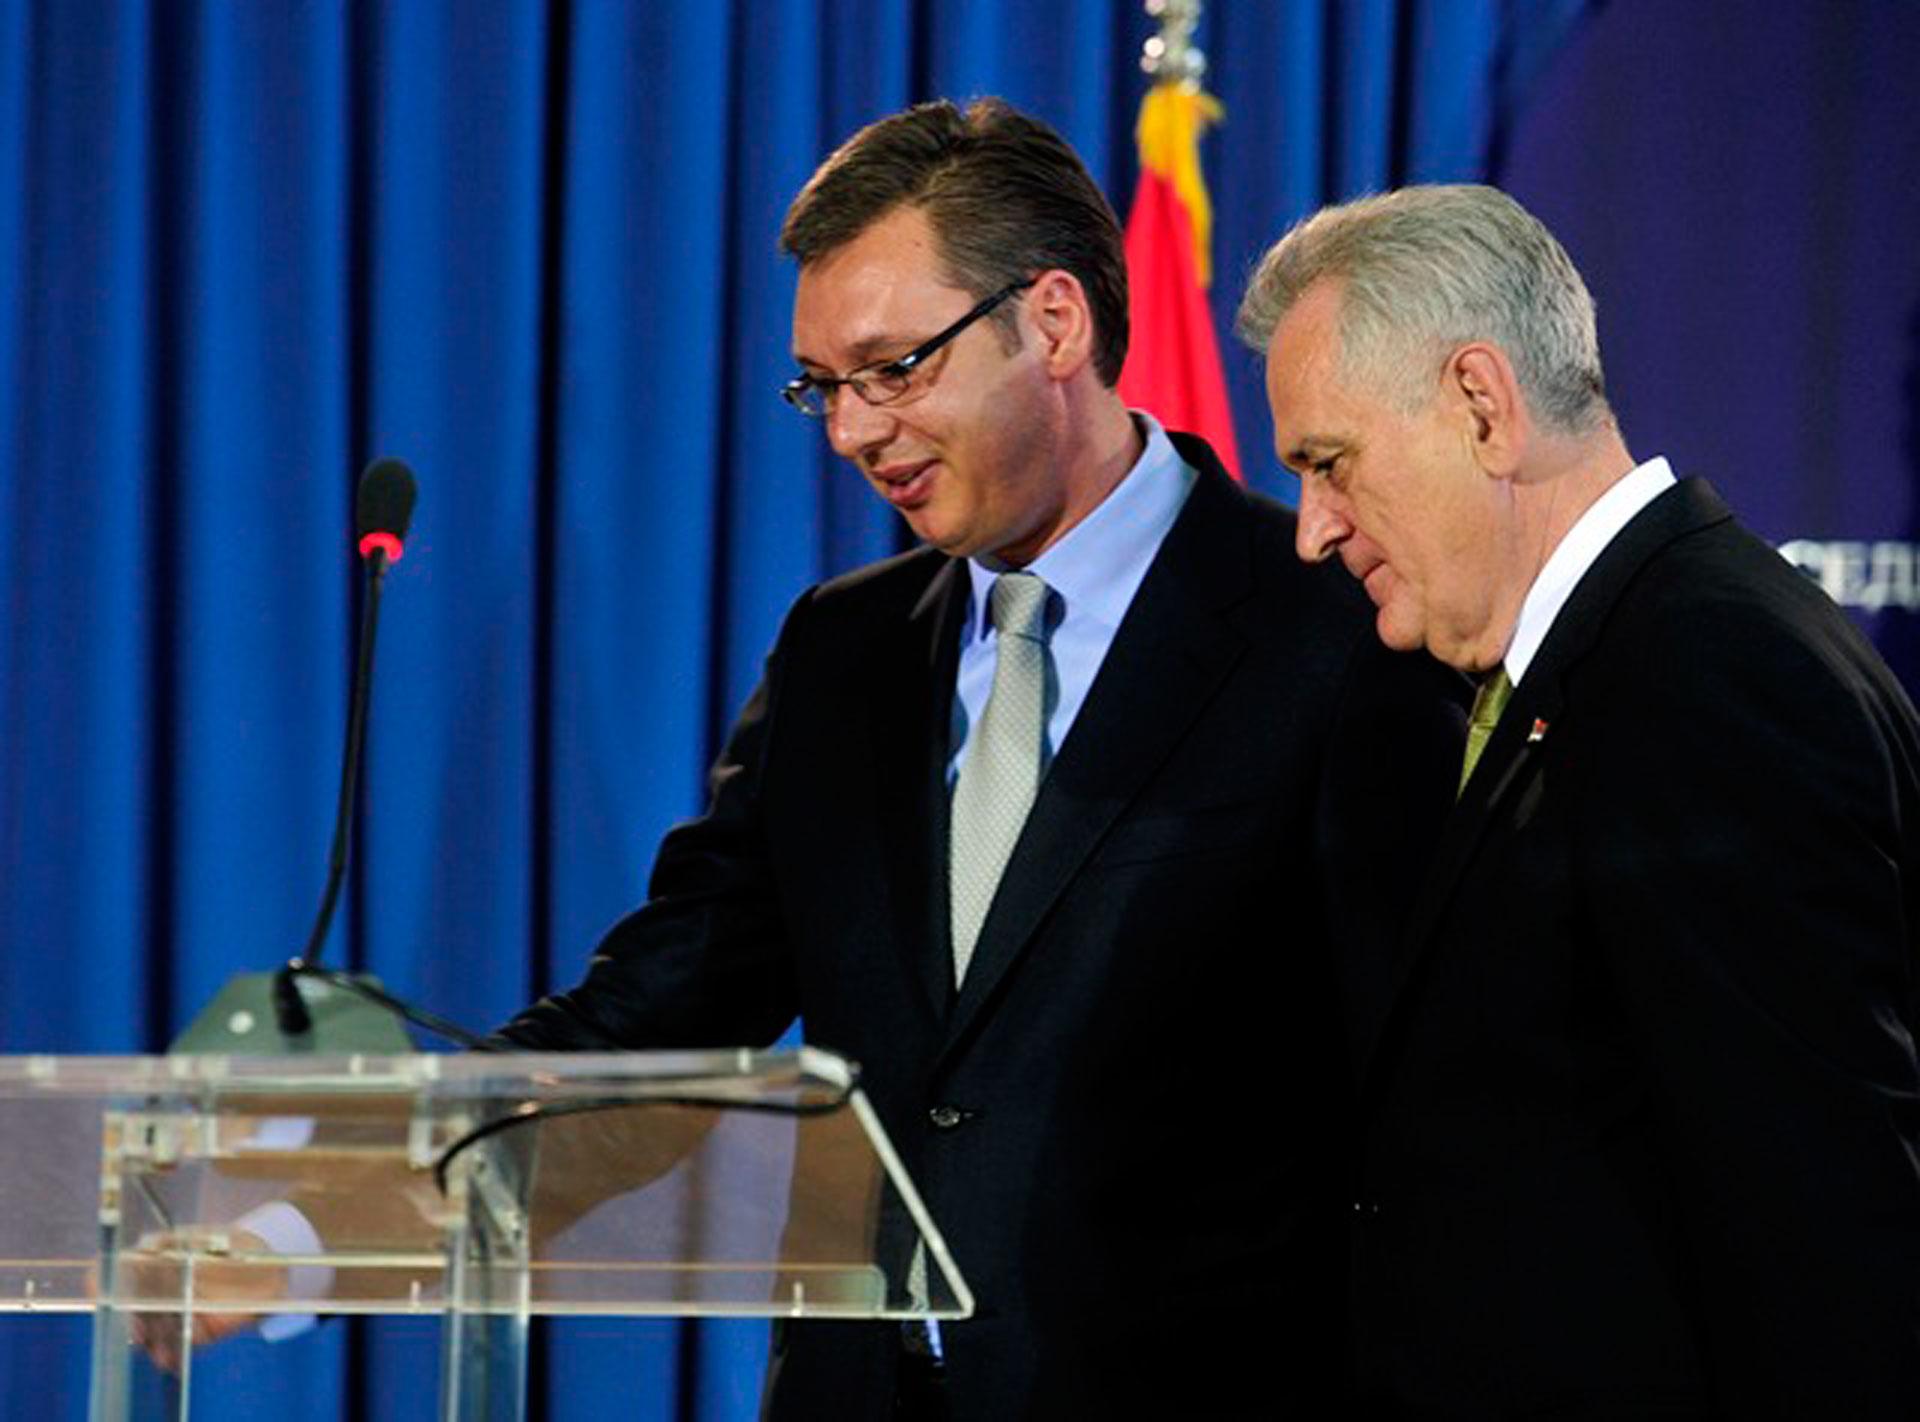 Vucic: I have full trust in Nikolic